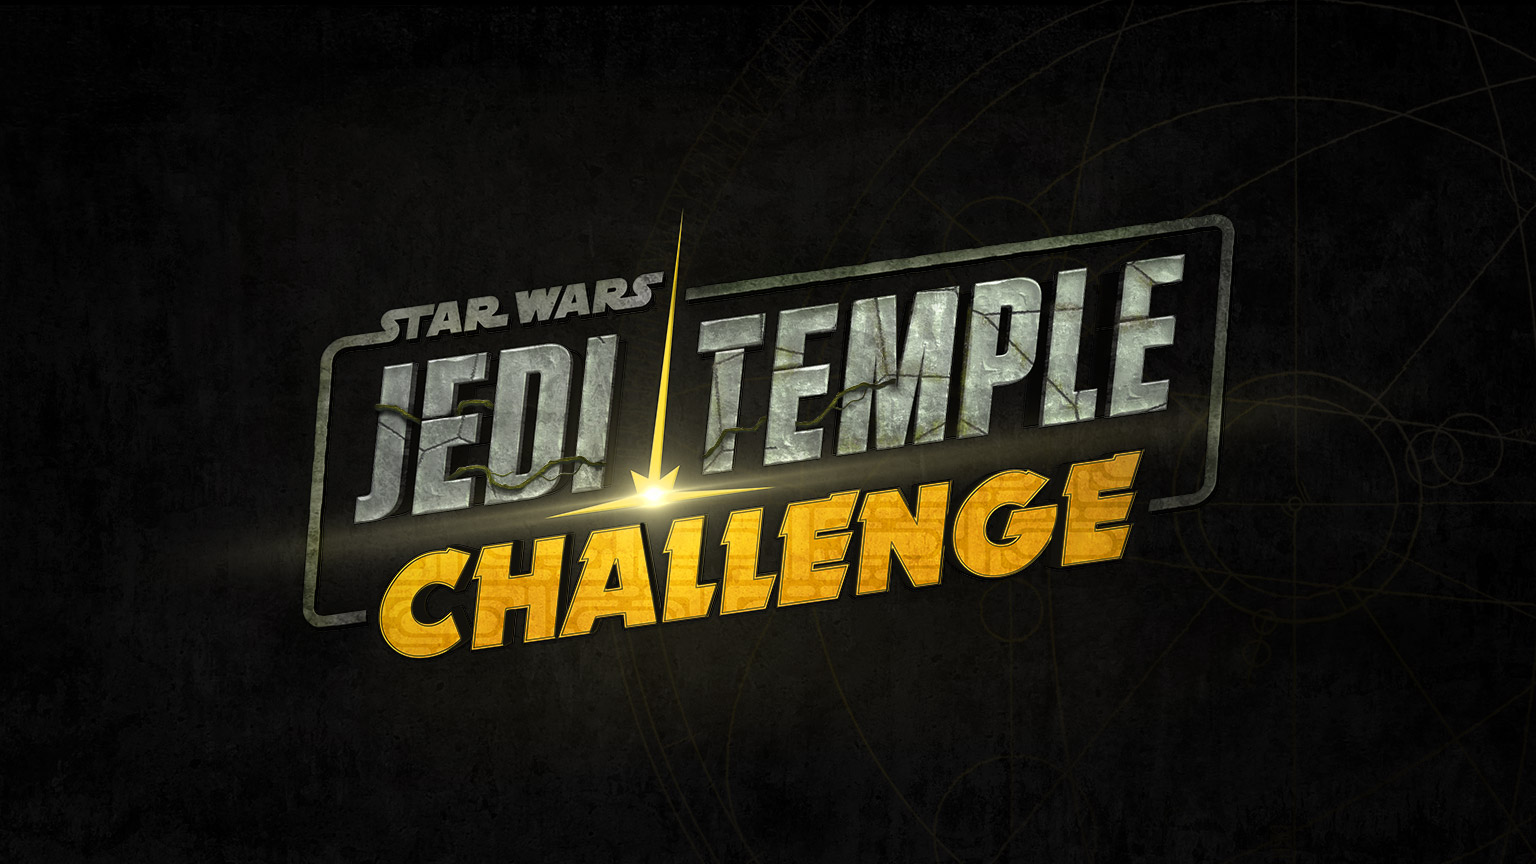 Star Wars Jedi Temple Challenge - www.culturageek.com.ar